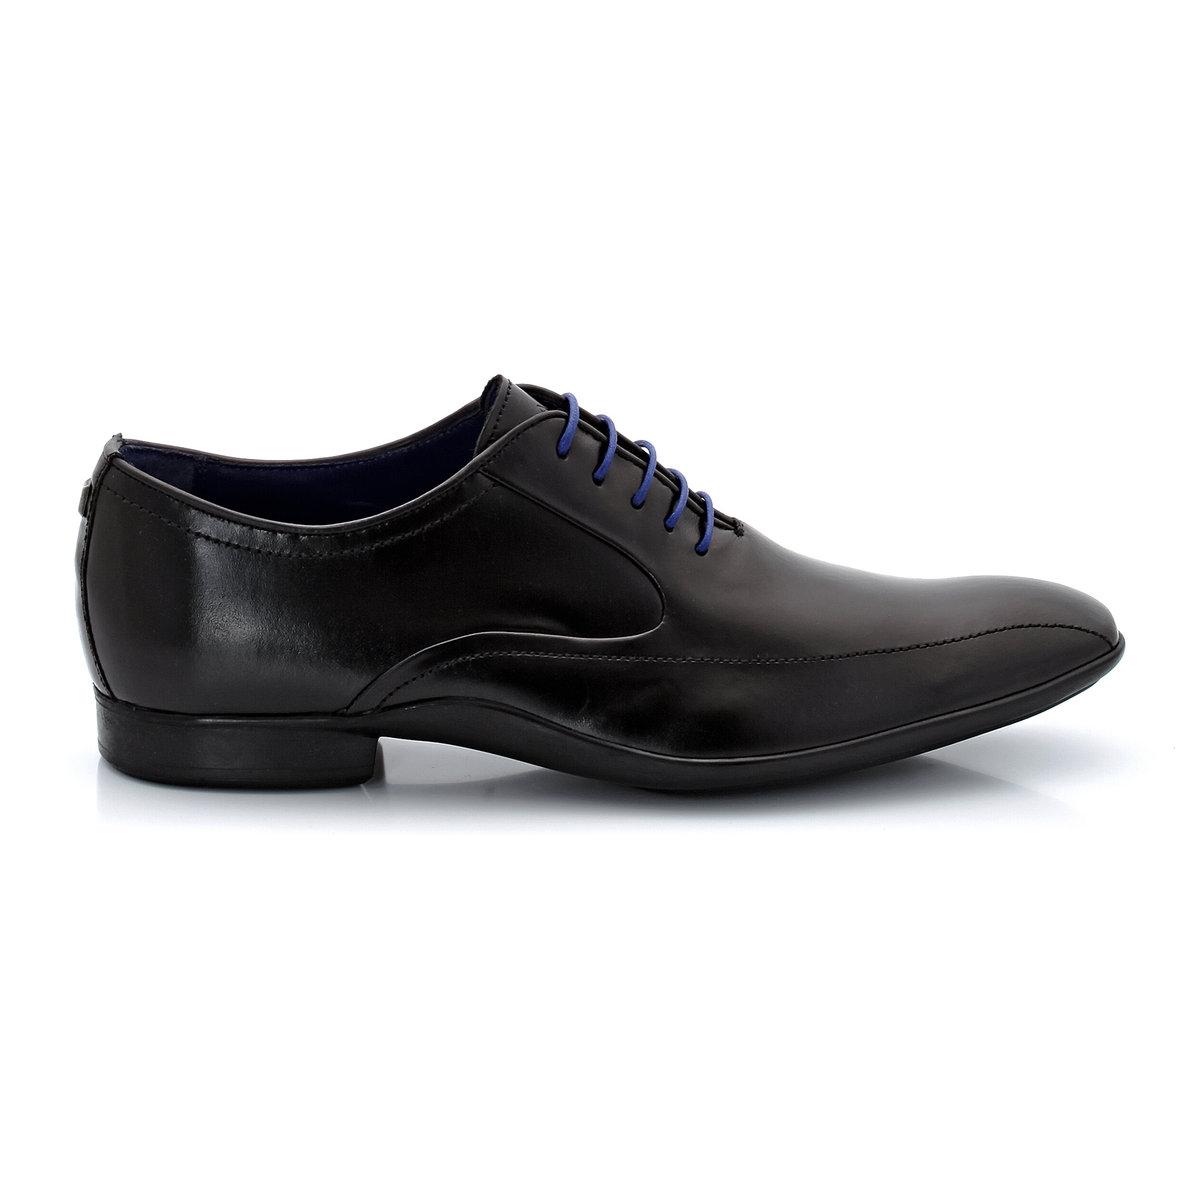 Ботинки-дерби серии Richelieu, из кожи, со шнуровкой